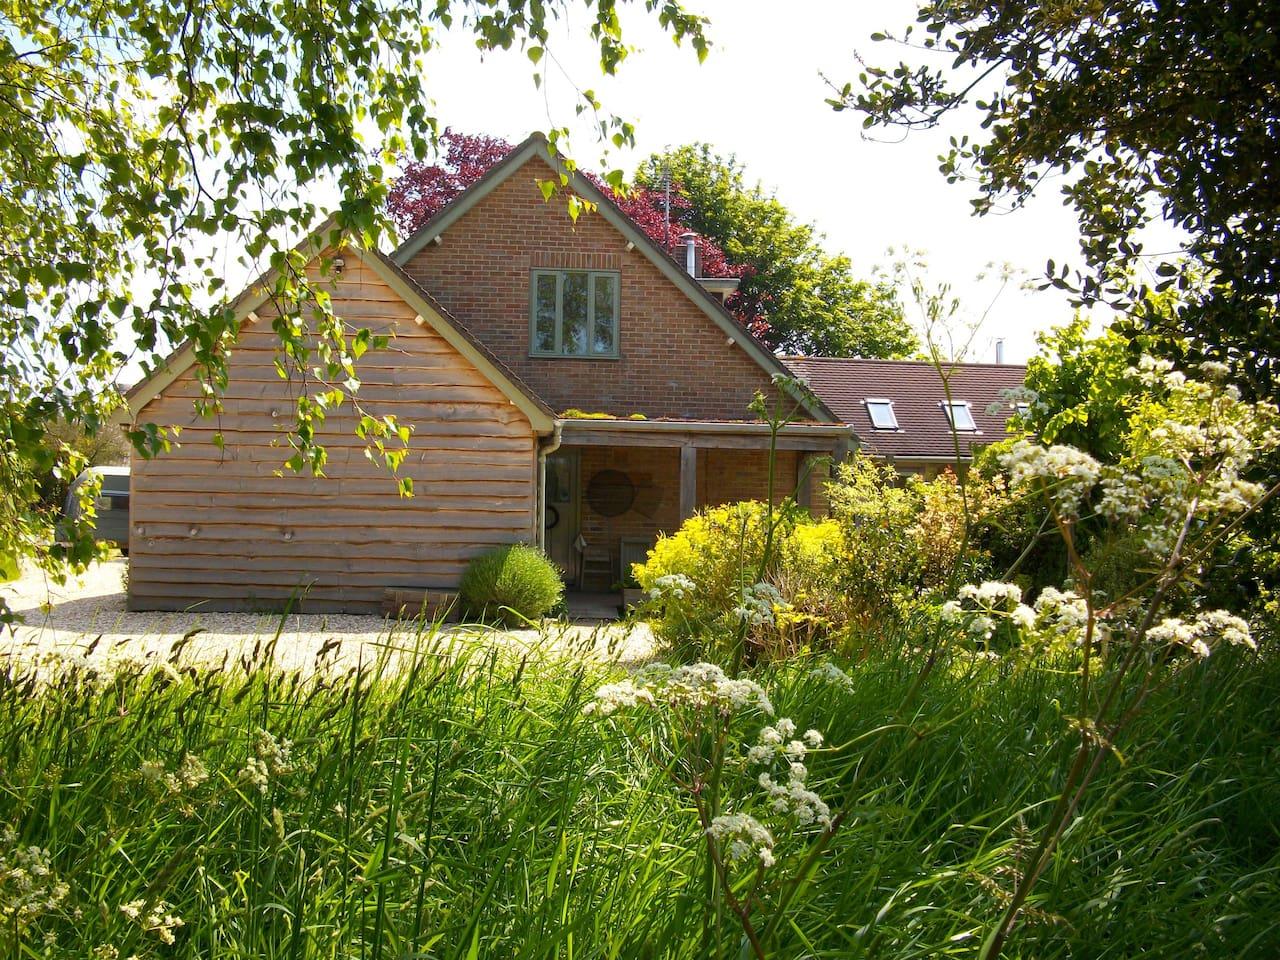 The cottage entrance & parking space